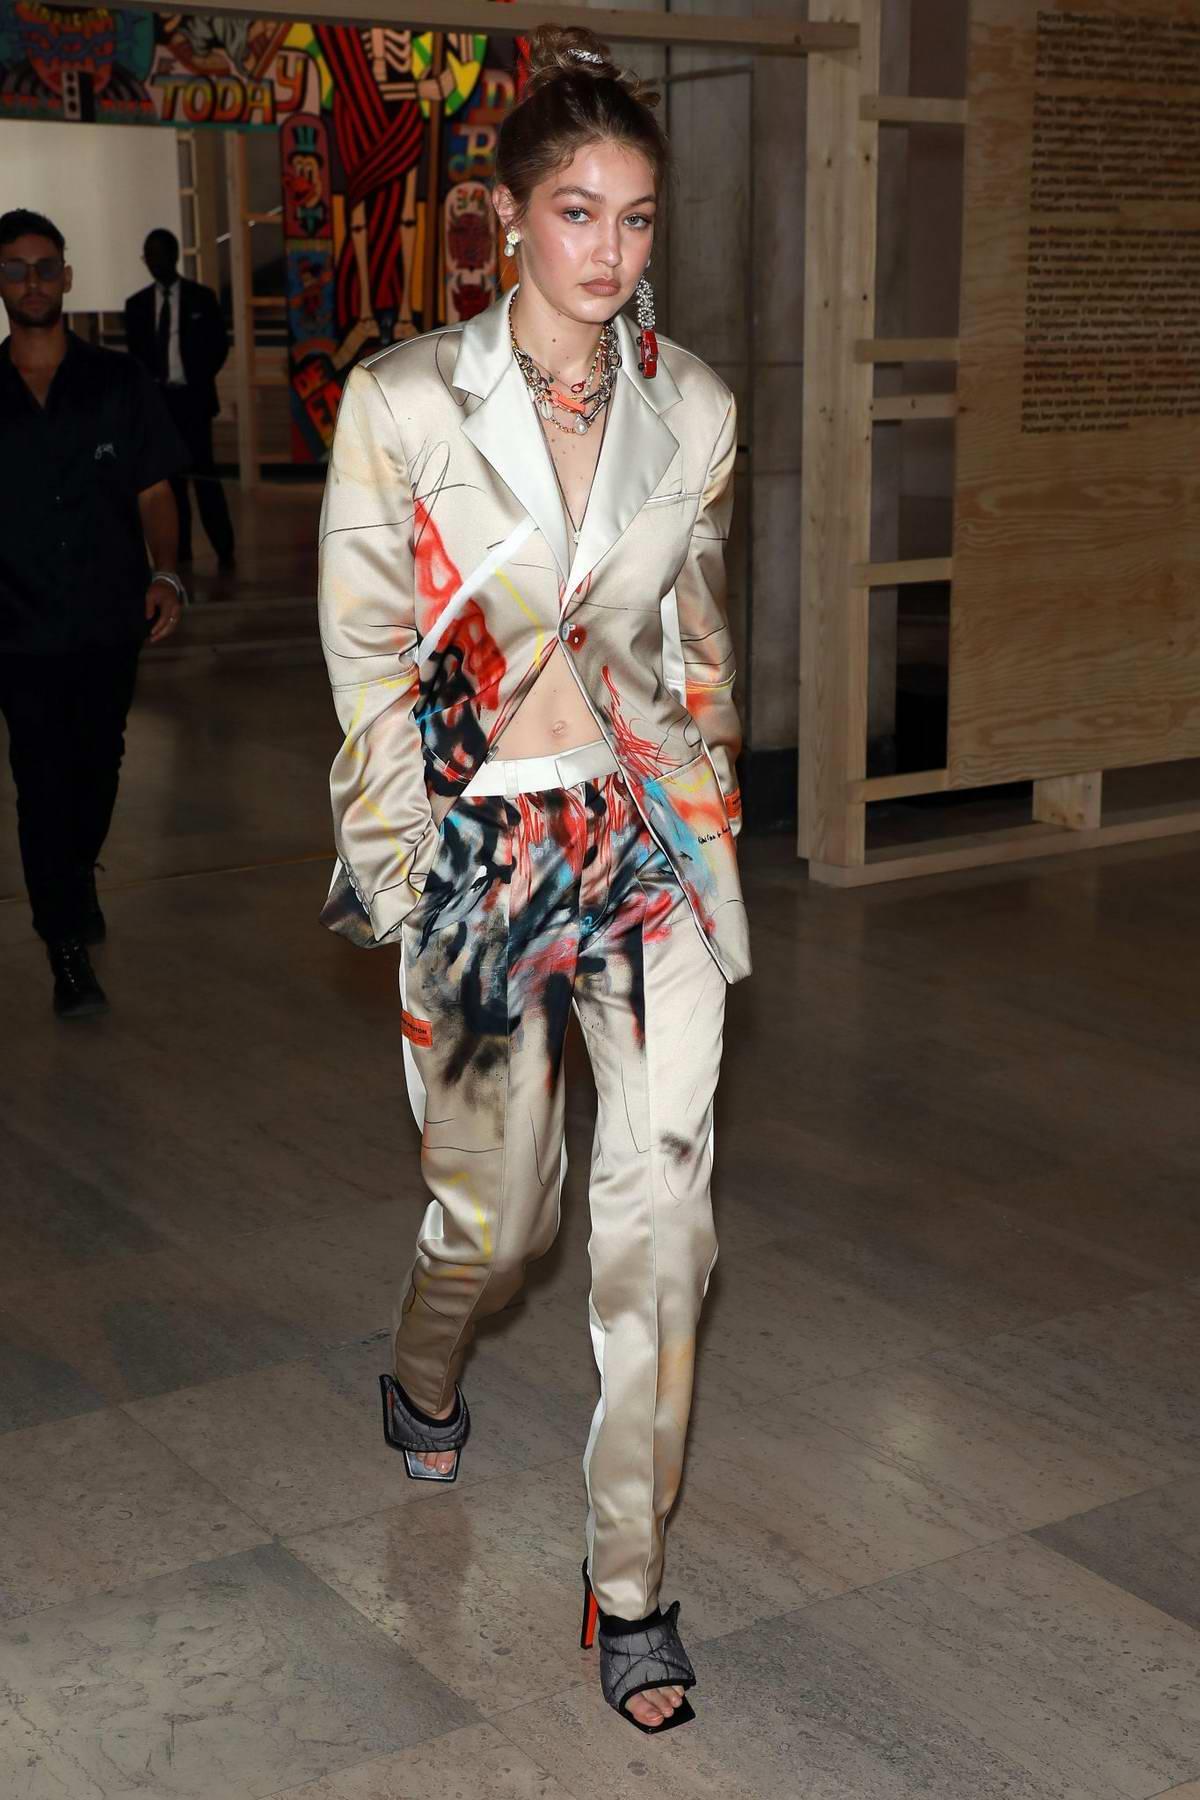 Gigi Hadid attends the Heron Preston Menswear Spring/Summer 2020 show during Paris Fashion Week in Paris, France